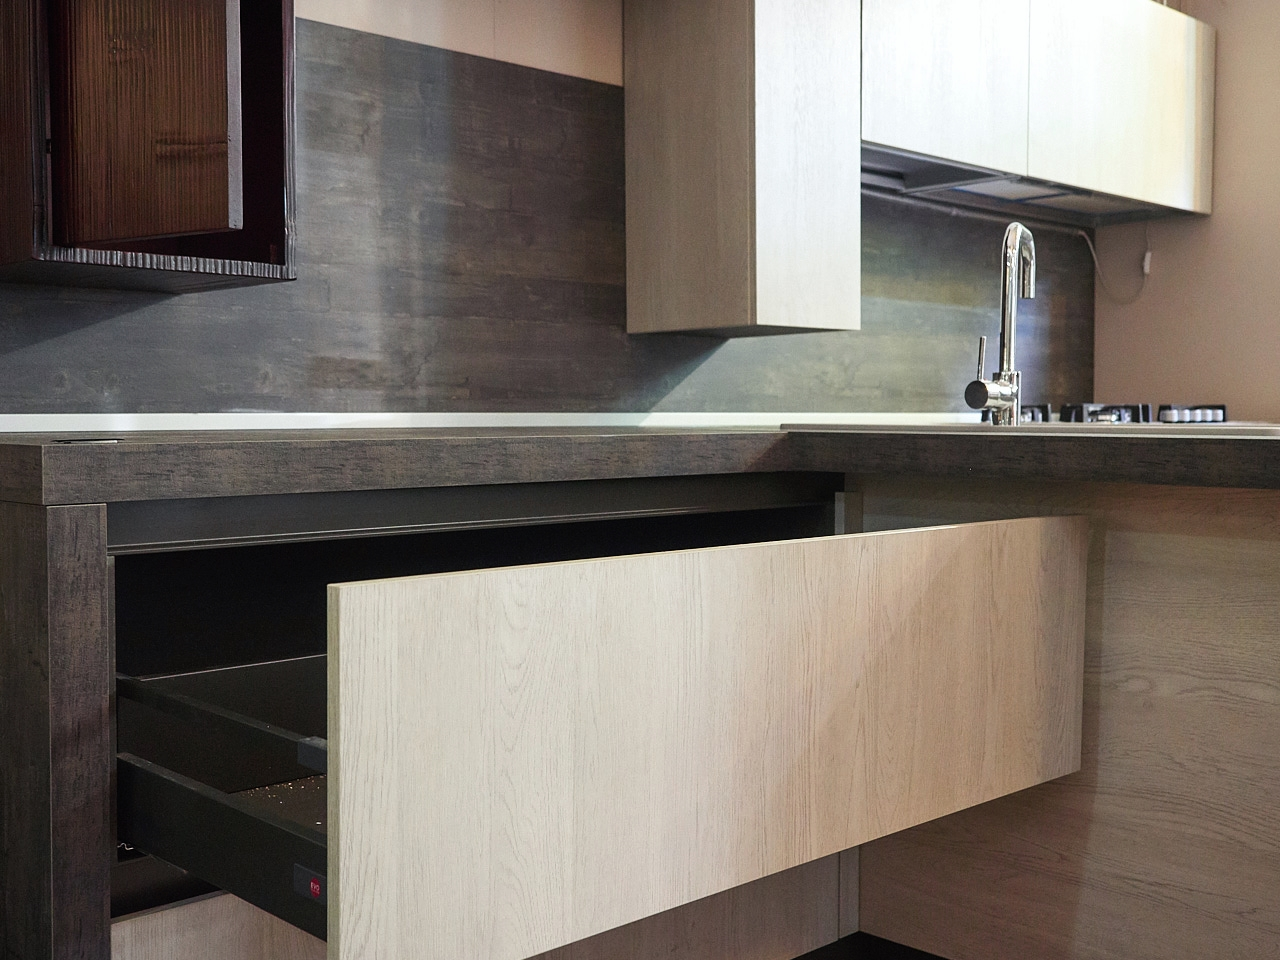 Cucina Moderna Essenza White E Red Bambu In Offerta Outlet